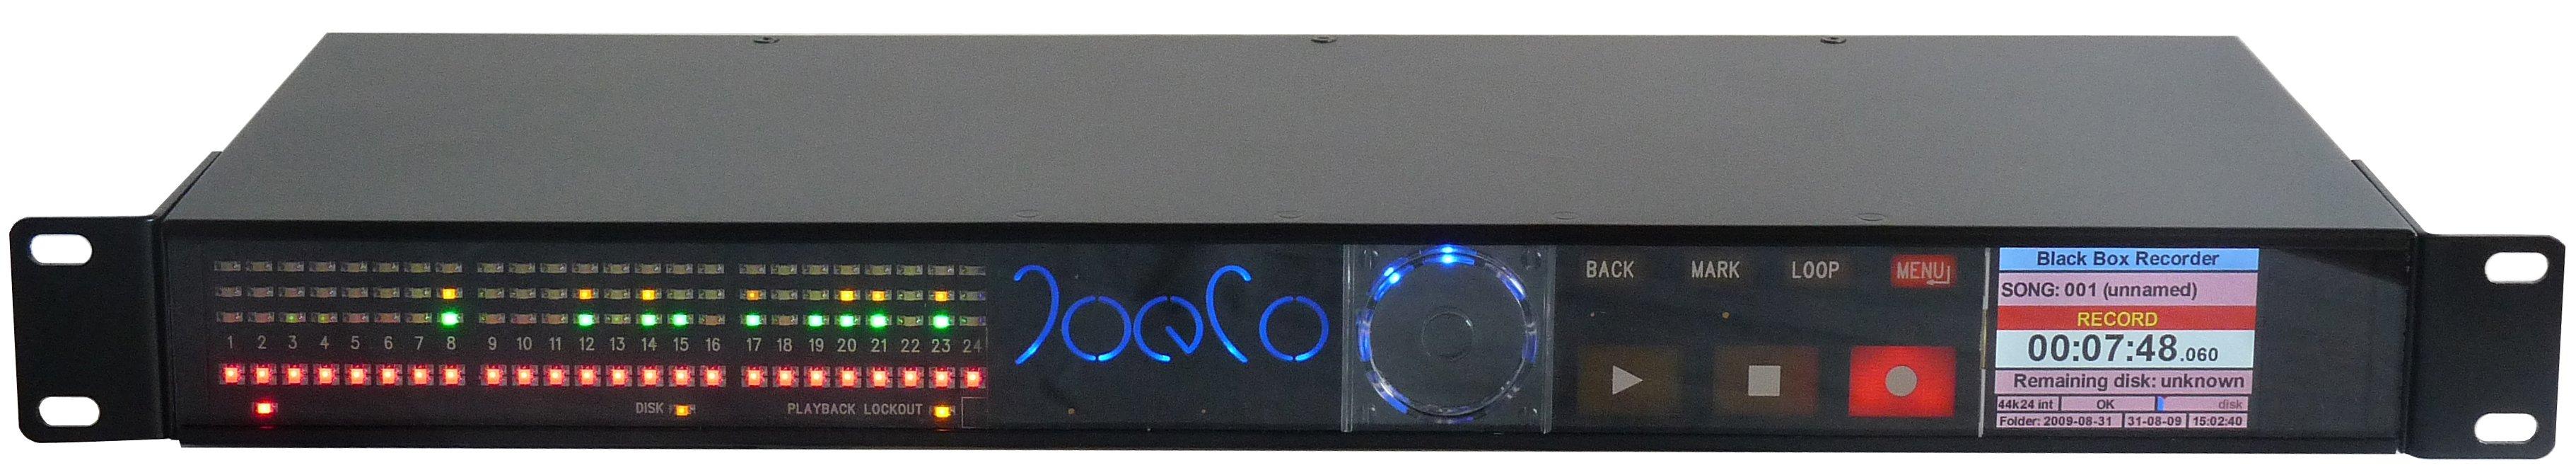 "Digital AES/EBU, Analog I/O 24 Track ""Blackbox Recorder"" (for Live Performance Recording)"